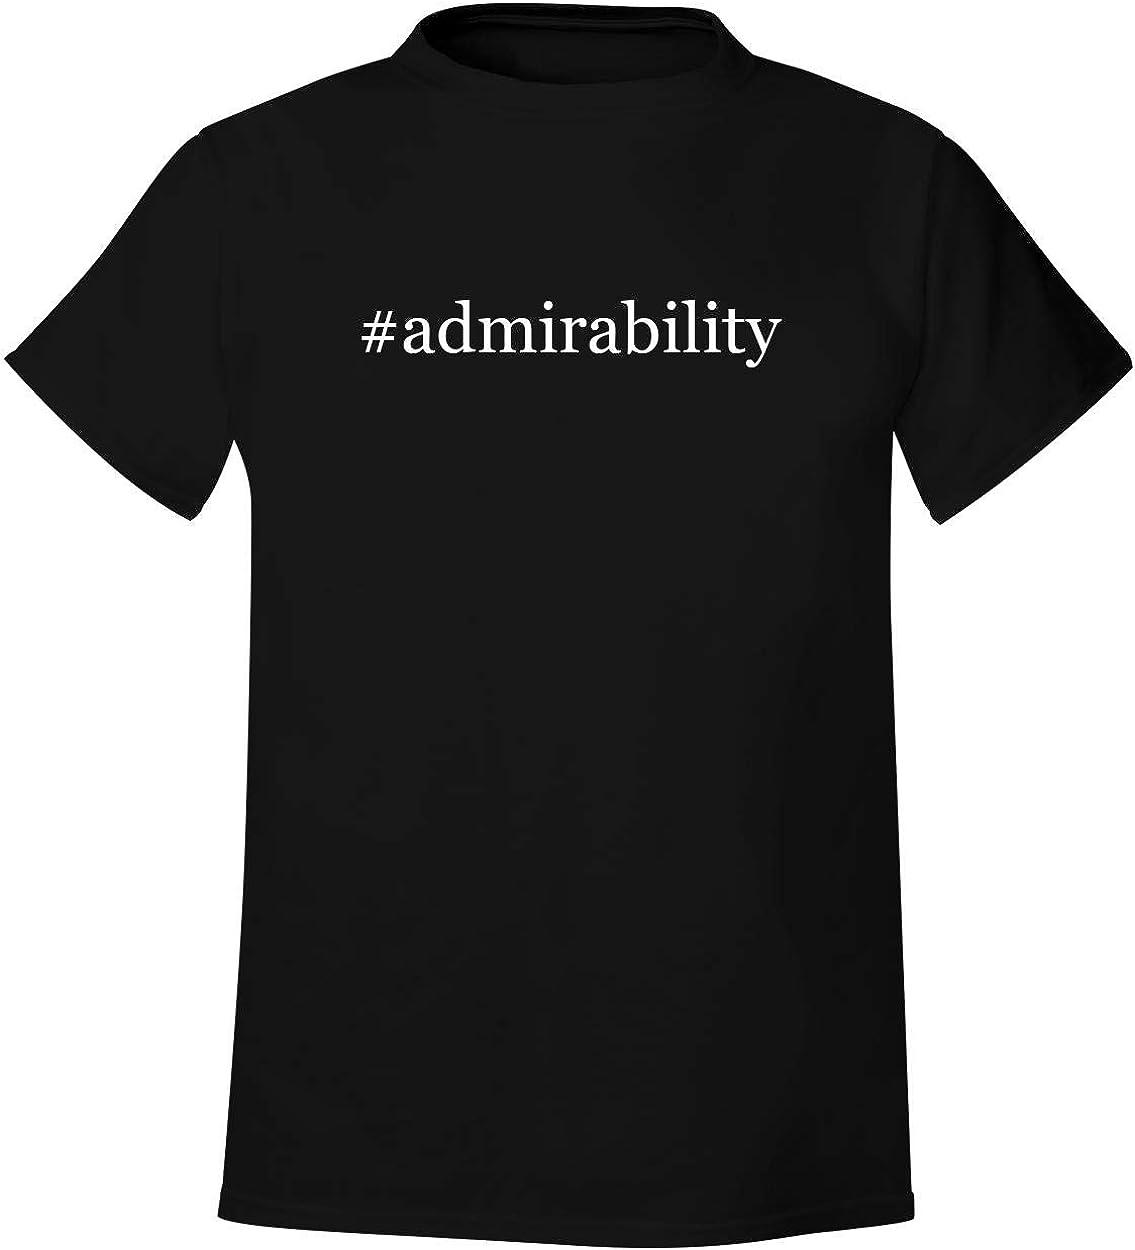 #admirability - Men's Hashtag Soft & Comfortable T-Shirt